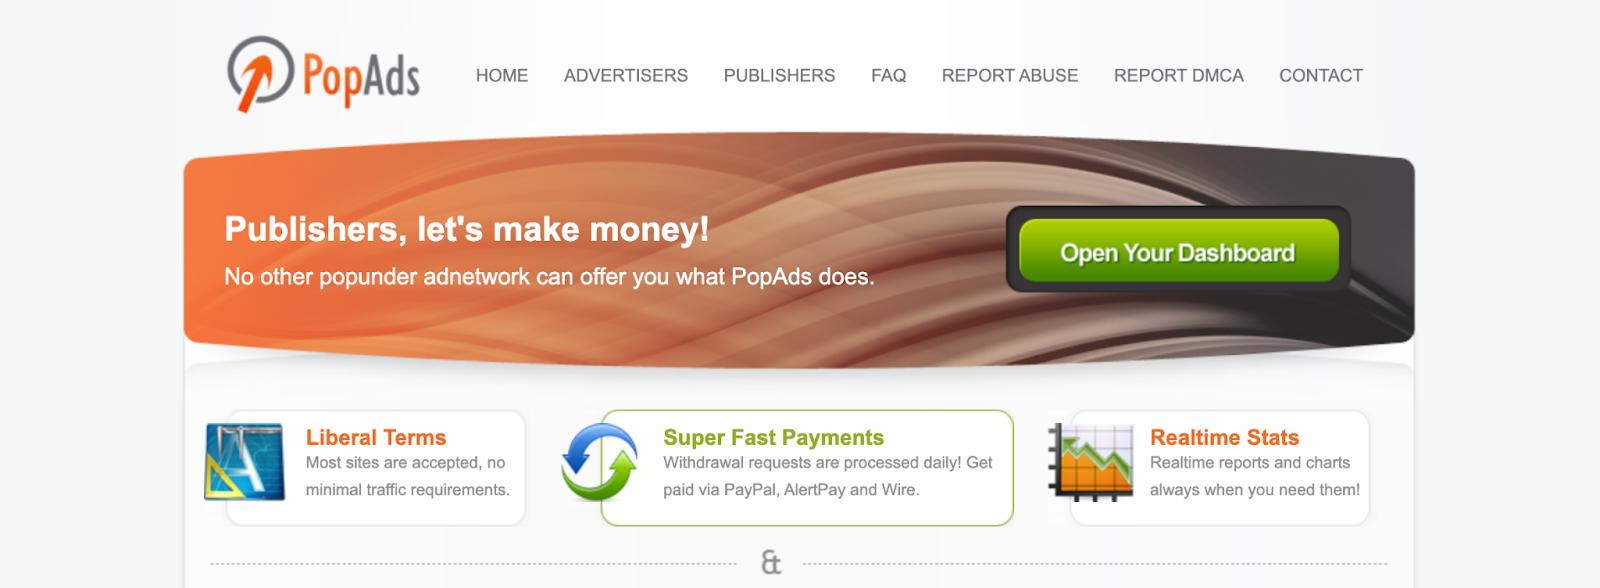 PopAds Homepage